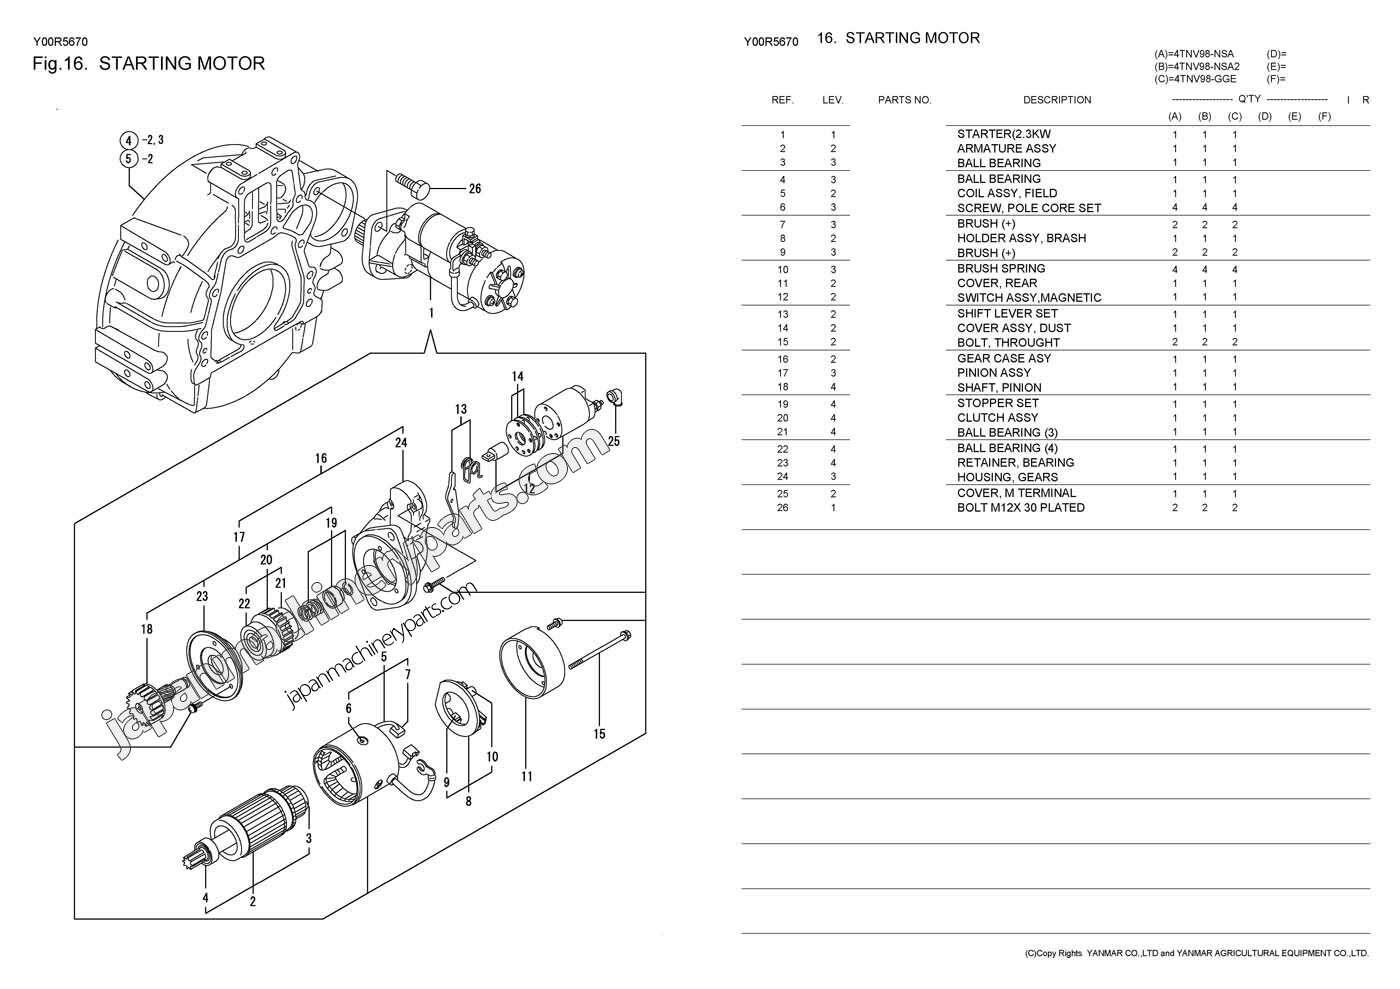 Yanmar 4tnv Wiring Diagrams Manual Guide Diagram Alternator Tractor Parts For Aichi 4tnv98 Nsa Nsa2 Gge Rh Japanmachineryparts Com Ym2200 Manuals